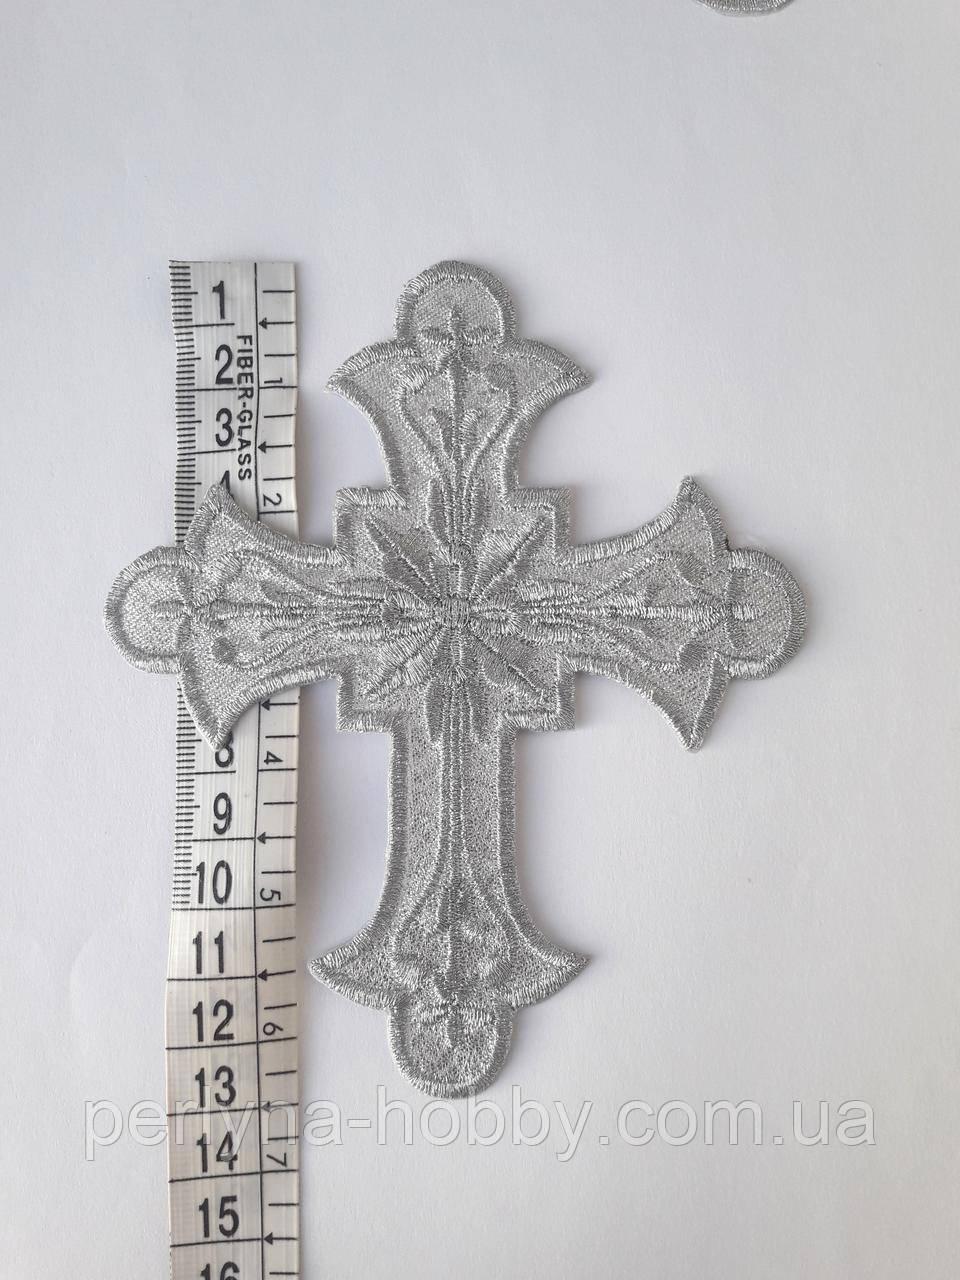 Хрест для церковного одягу малий аплікація клейова 13.5х10.5 см срібло.Крест аппликация клеевая